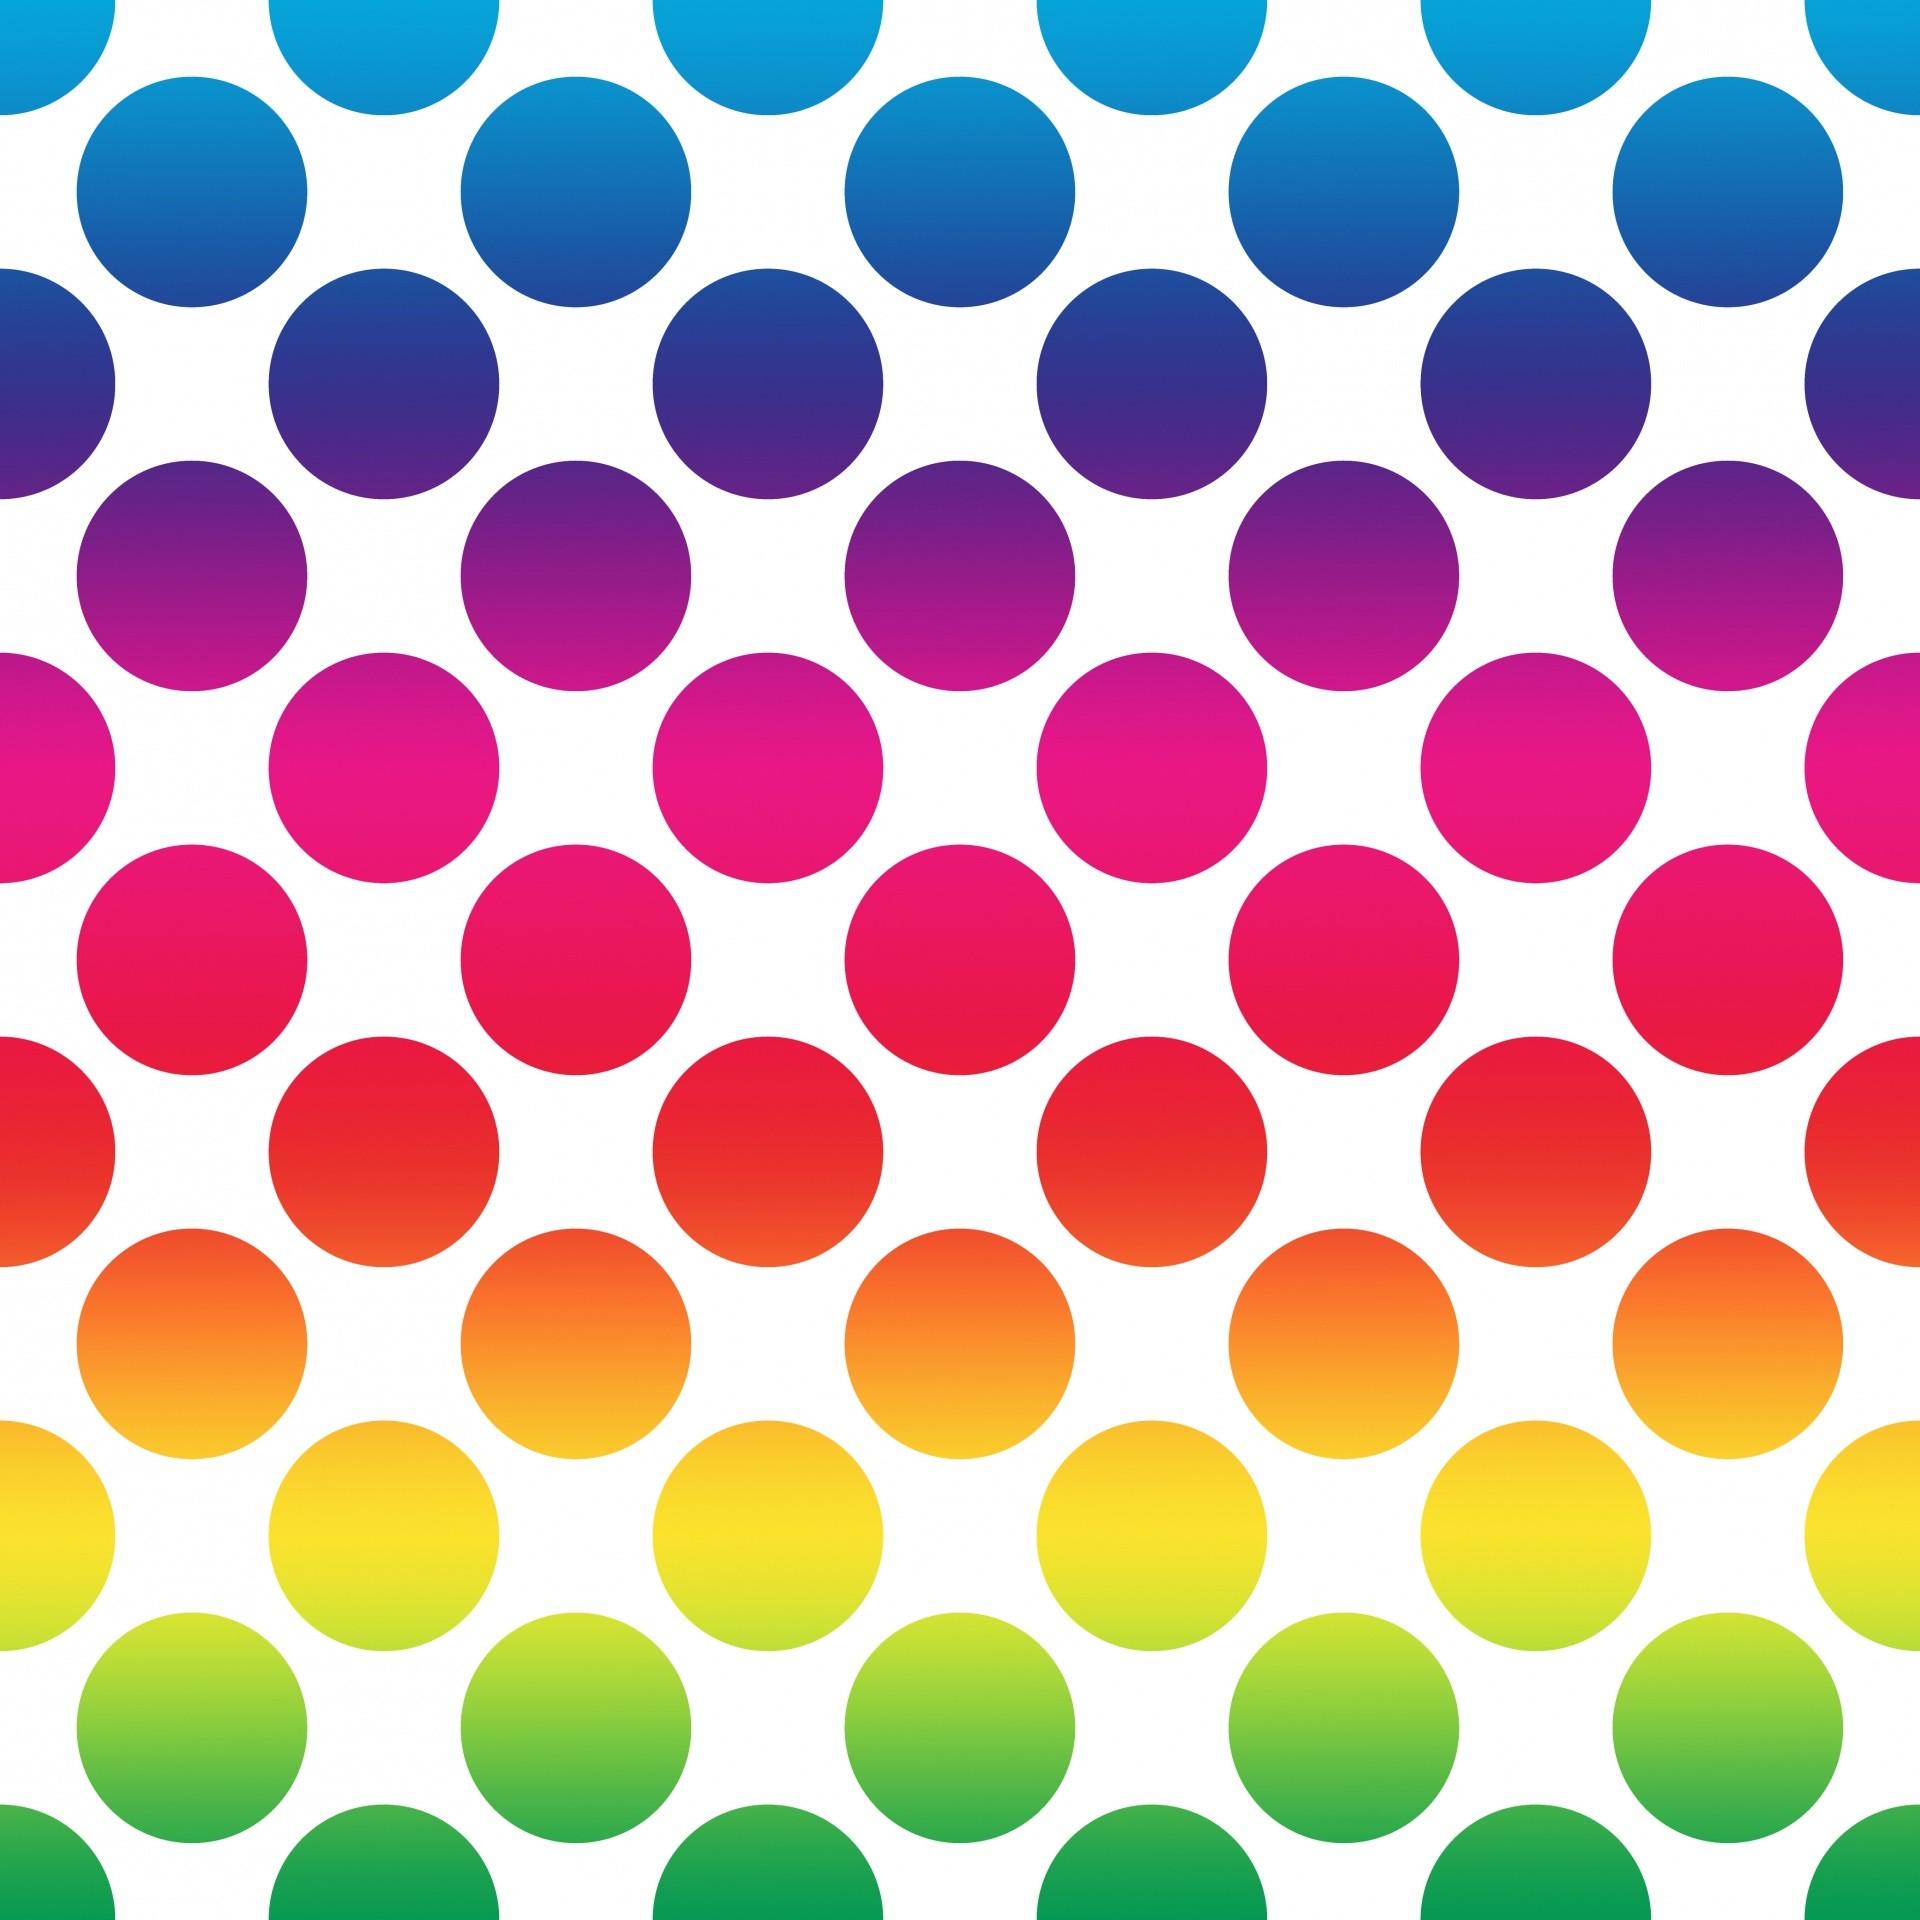 Polka Dot Wallpaper (54+ images)